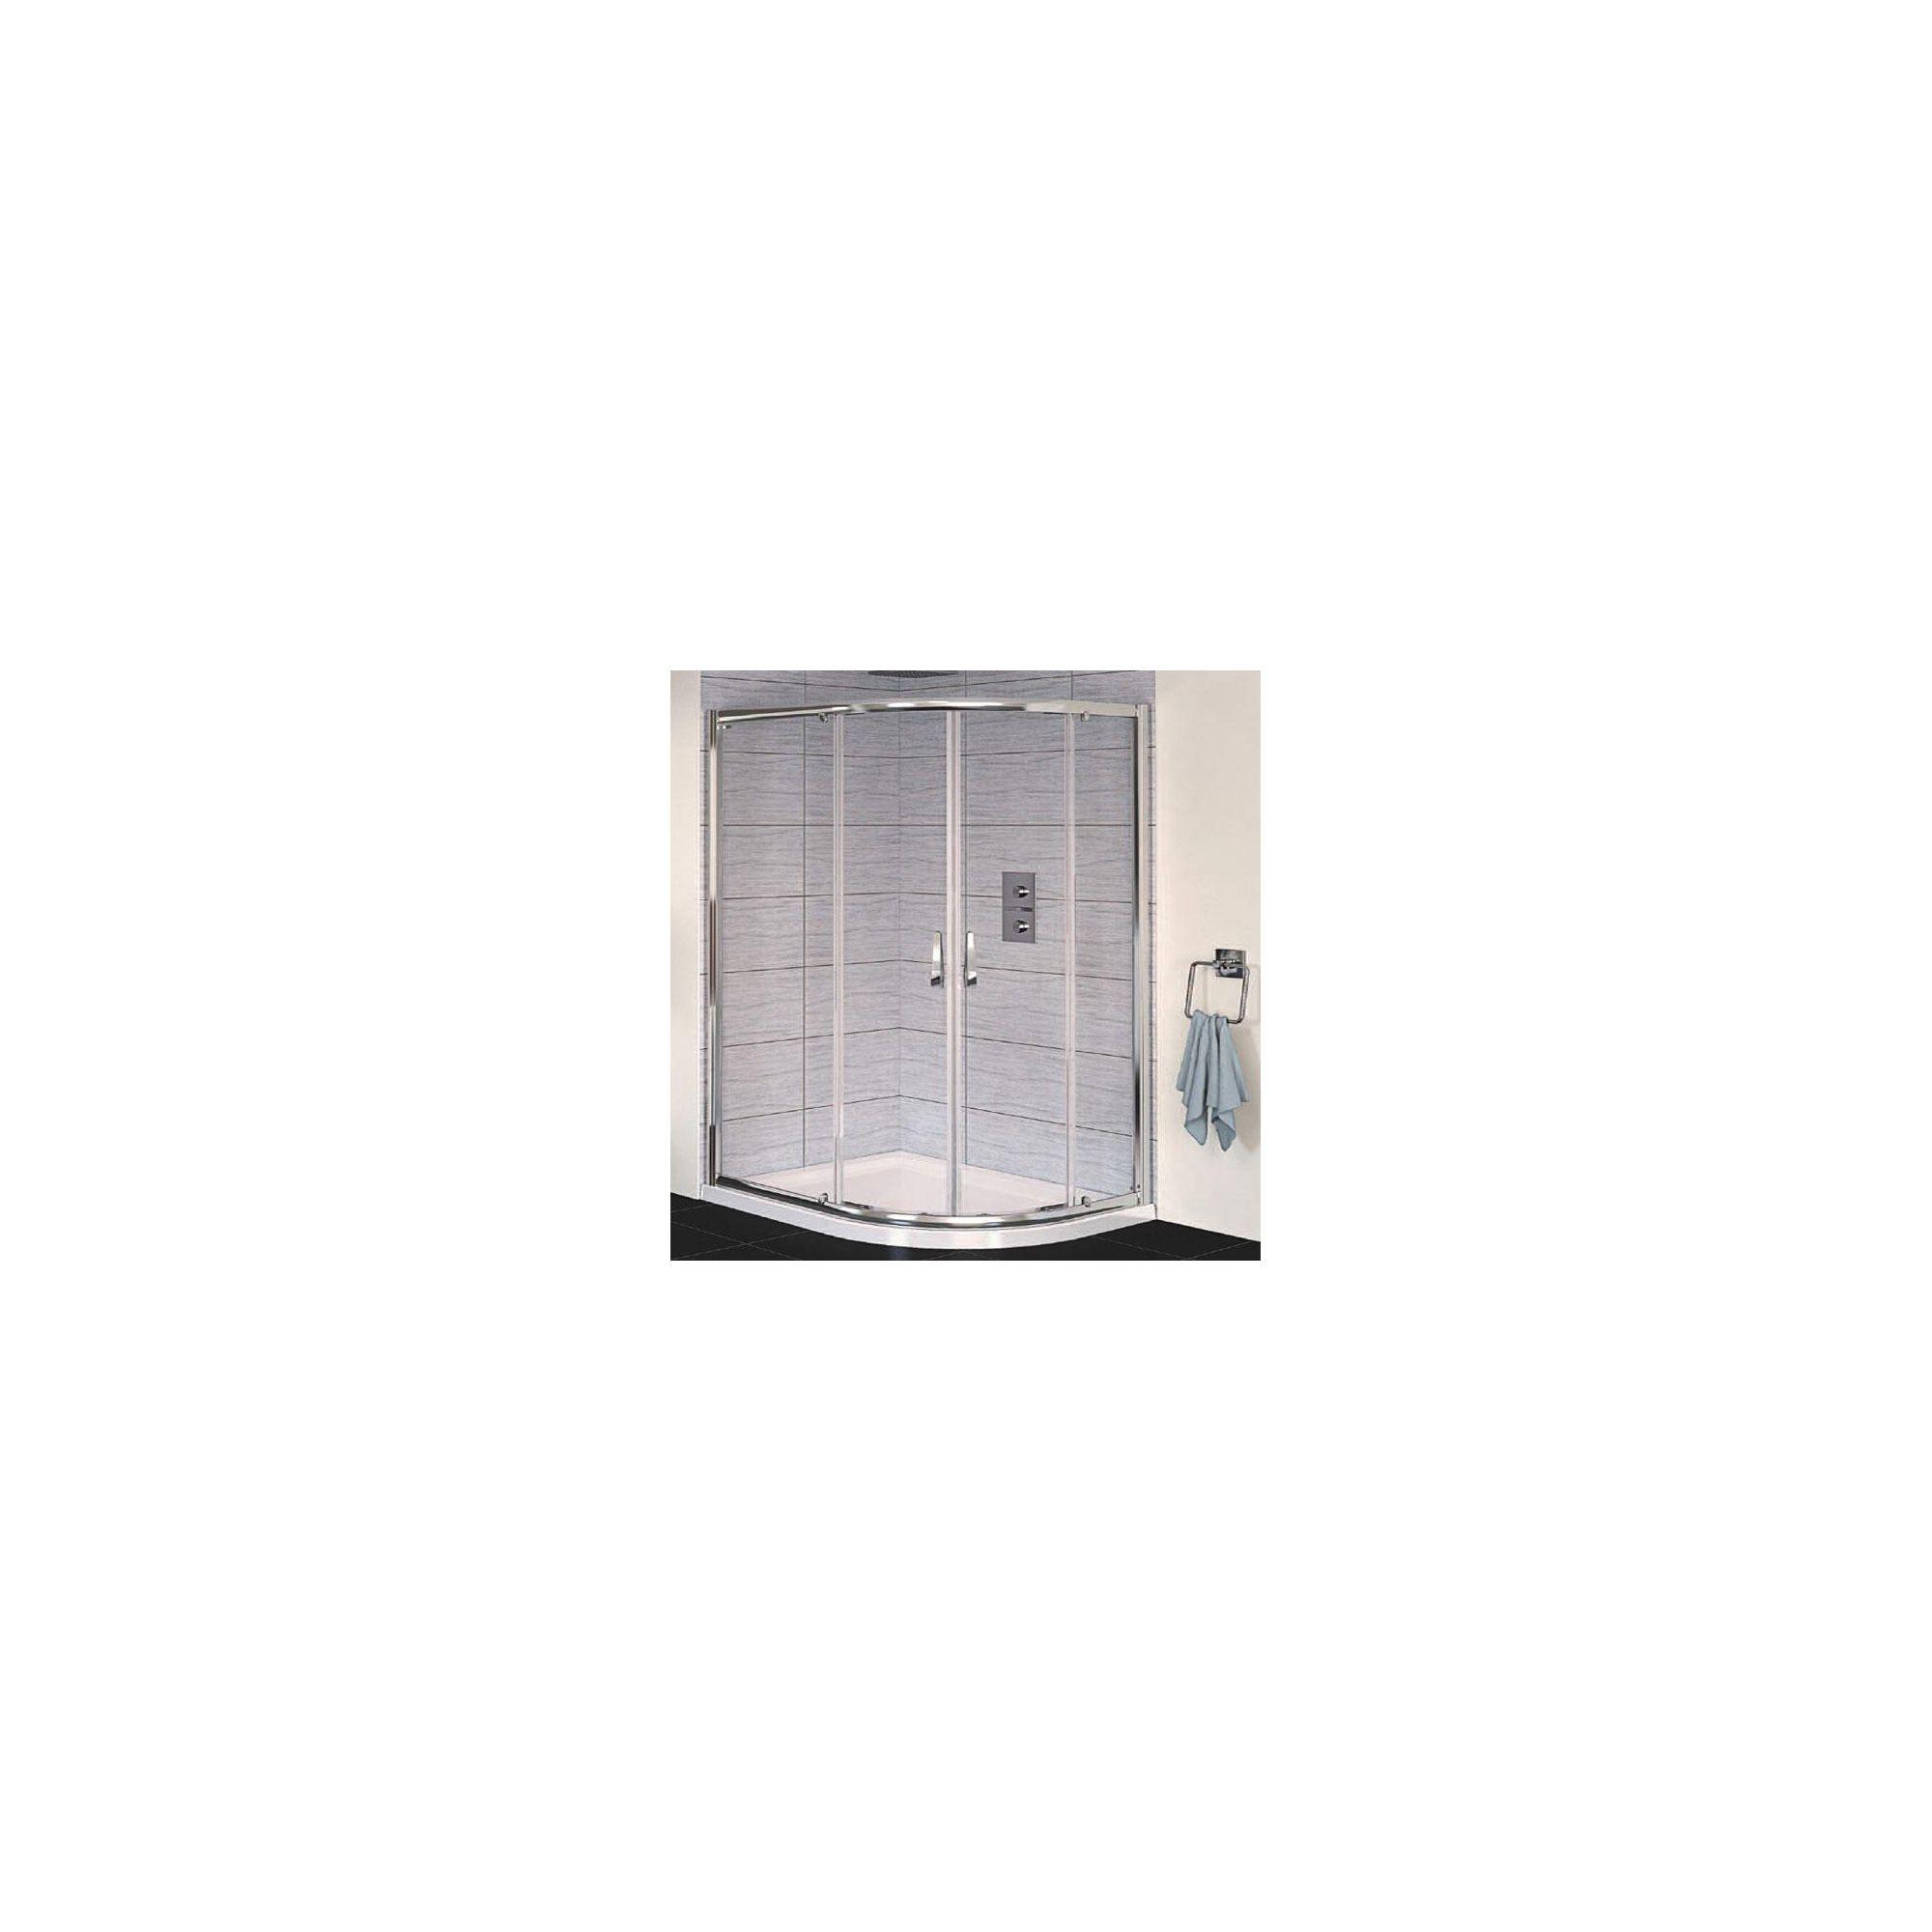 Aqualux AQUA6 Offset Quadrant Shower Door, 1200mm x 800mm, Polished Silver Frame, 6mm Glass at Tesco Direct